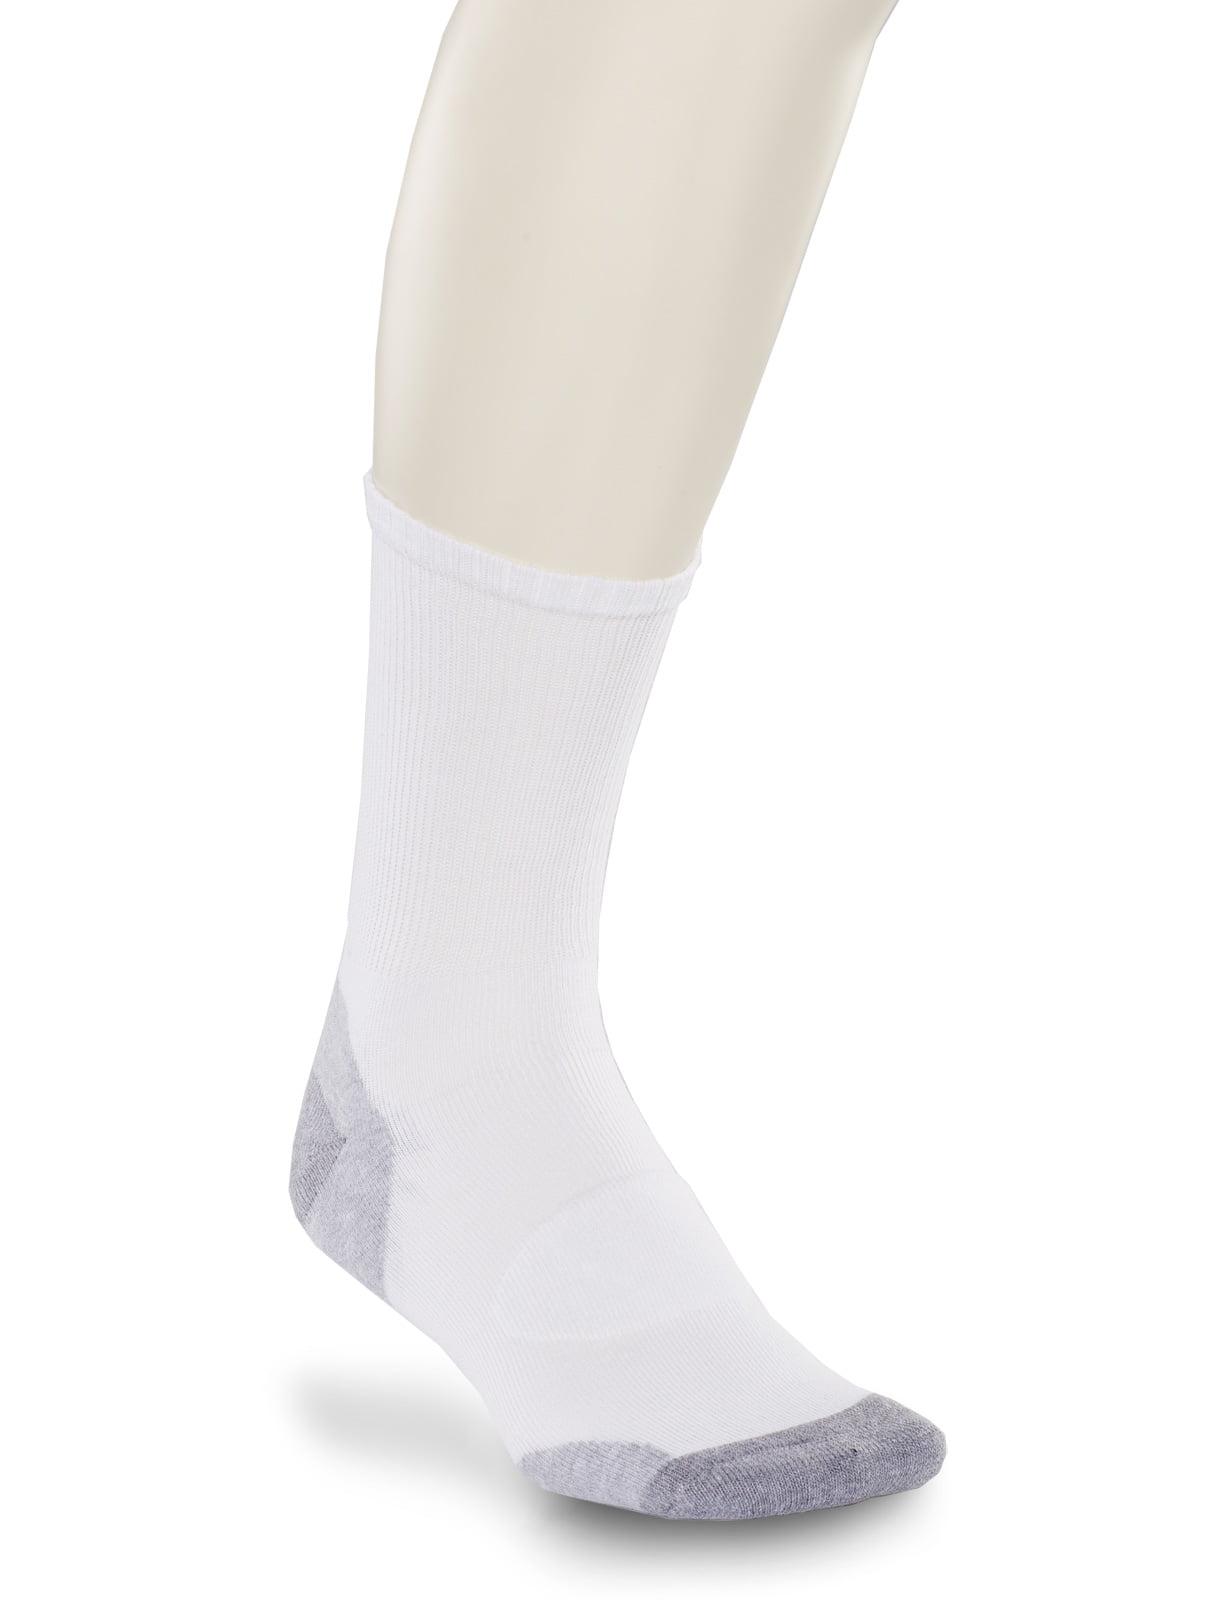 Men's Big & Tall Harbor Bay 3-pk Balance Point Continuous Comfort Crew Socks